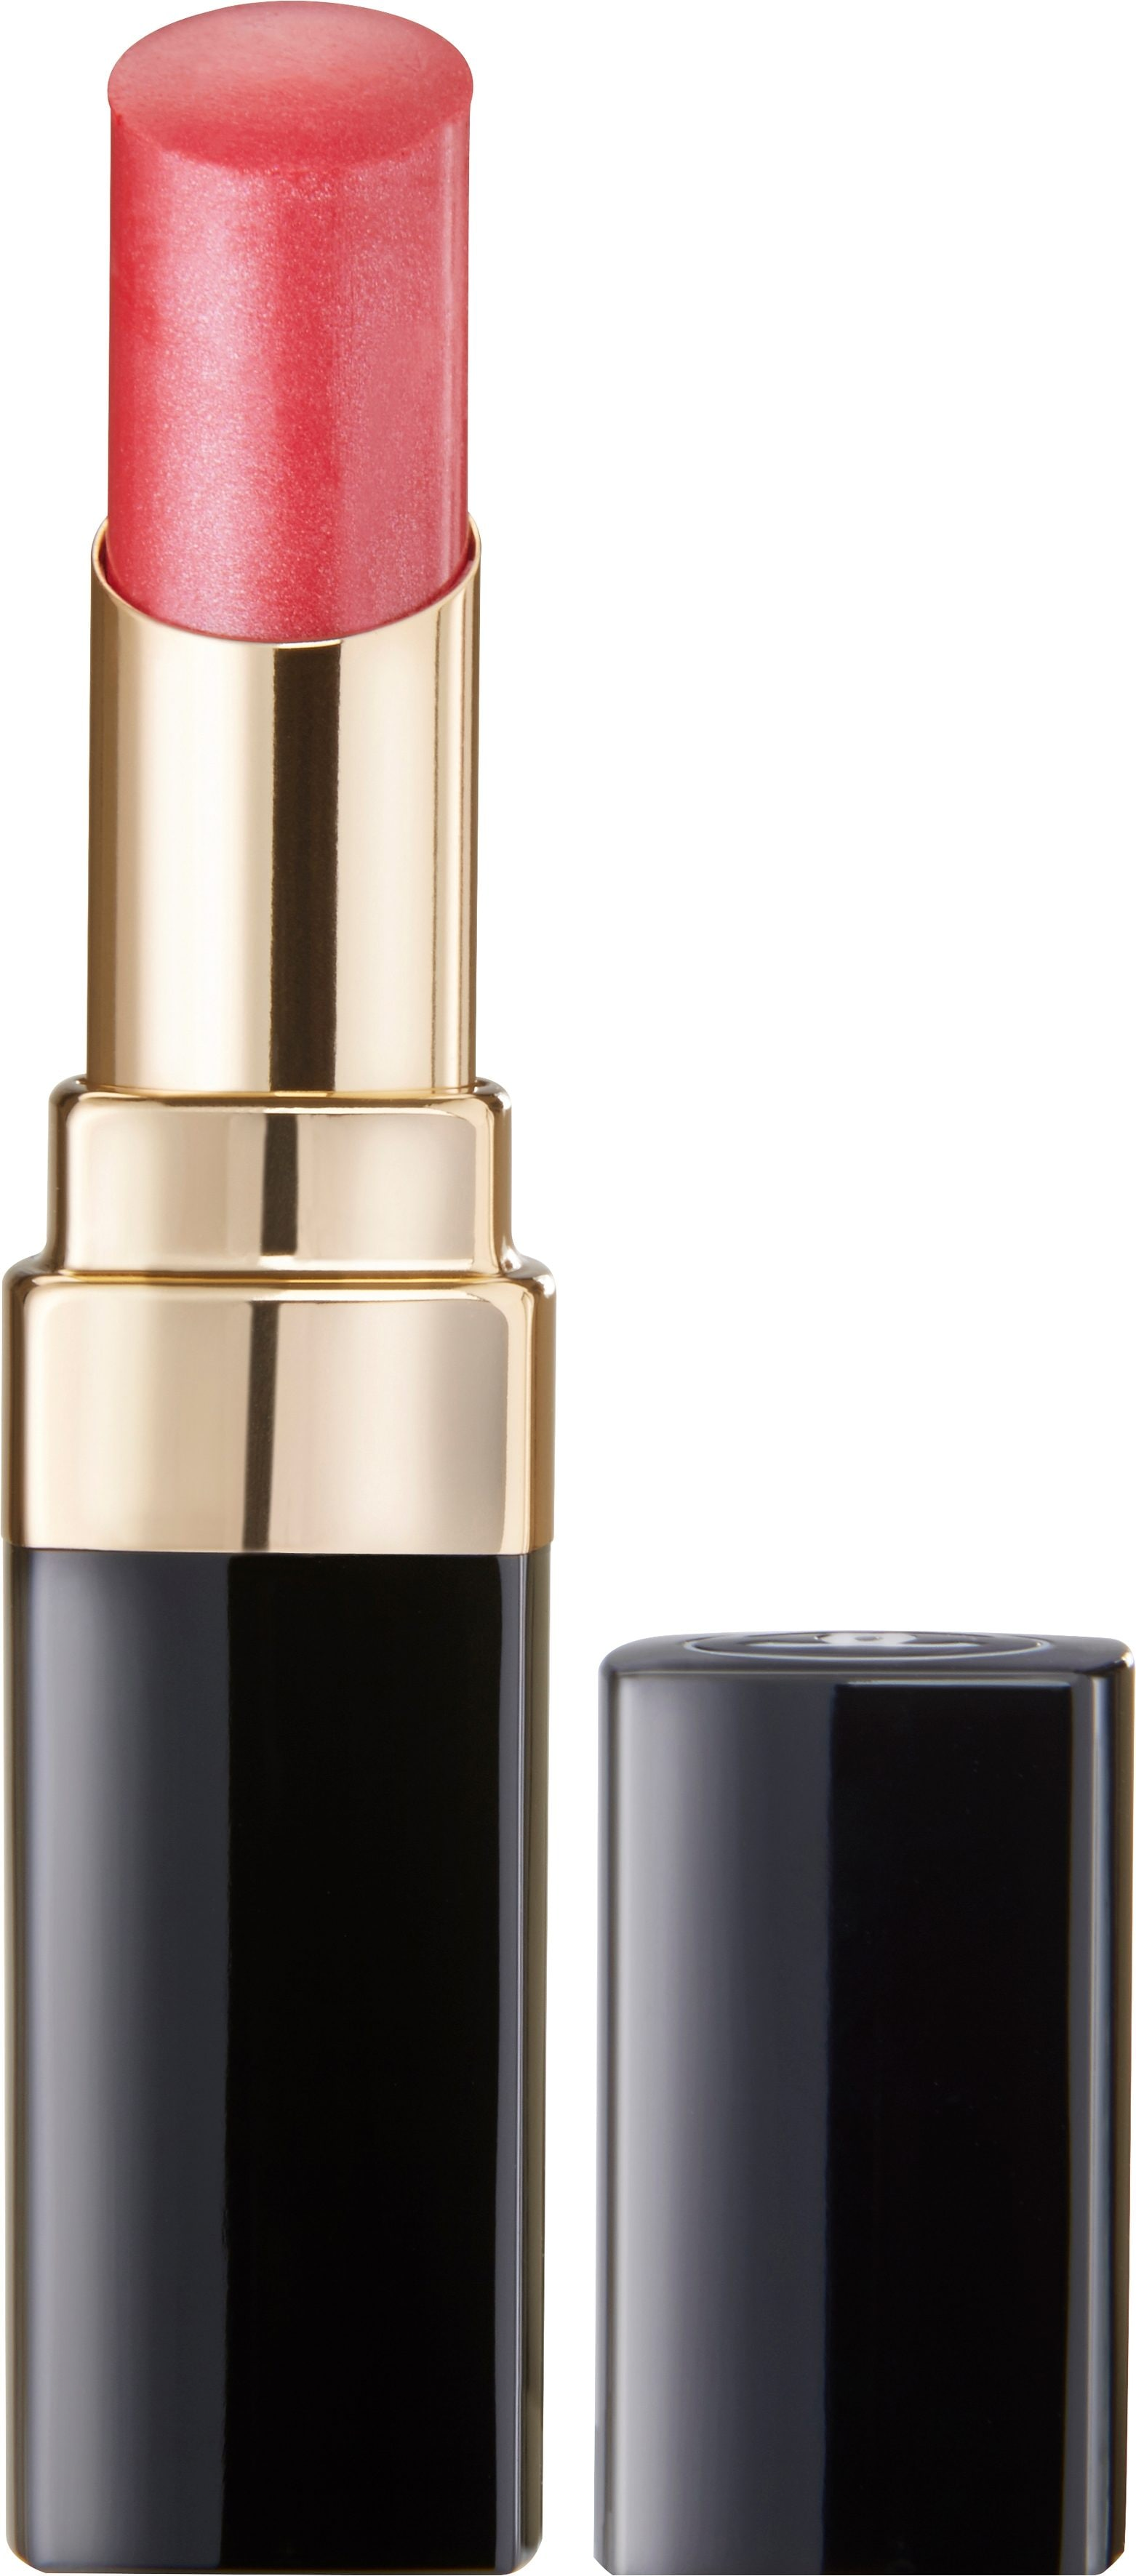 Chanel,  Rouge Coco Shine , Lippenstift Preisvergleich